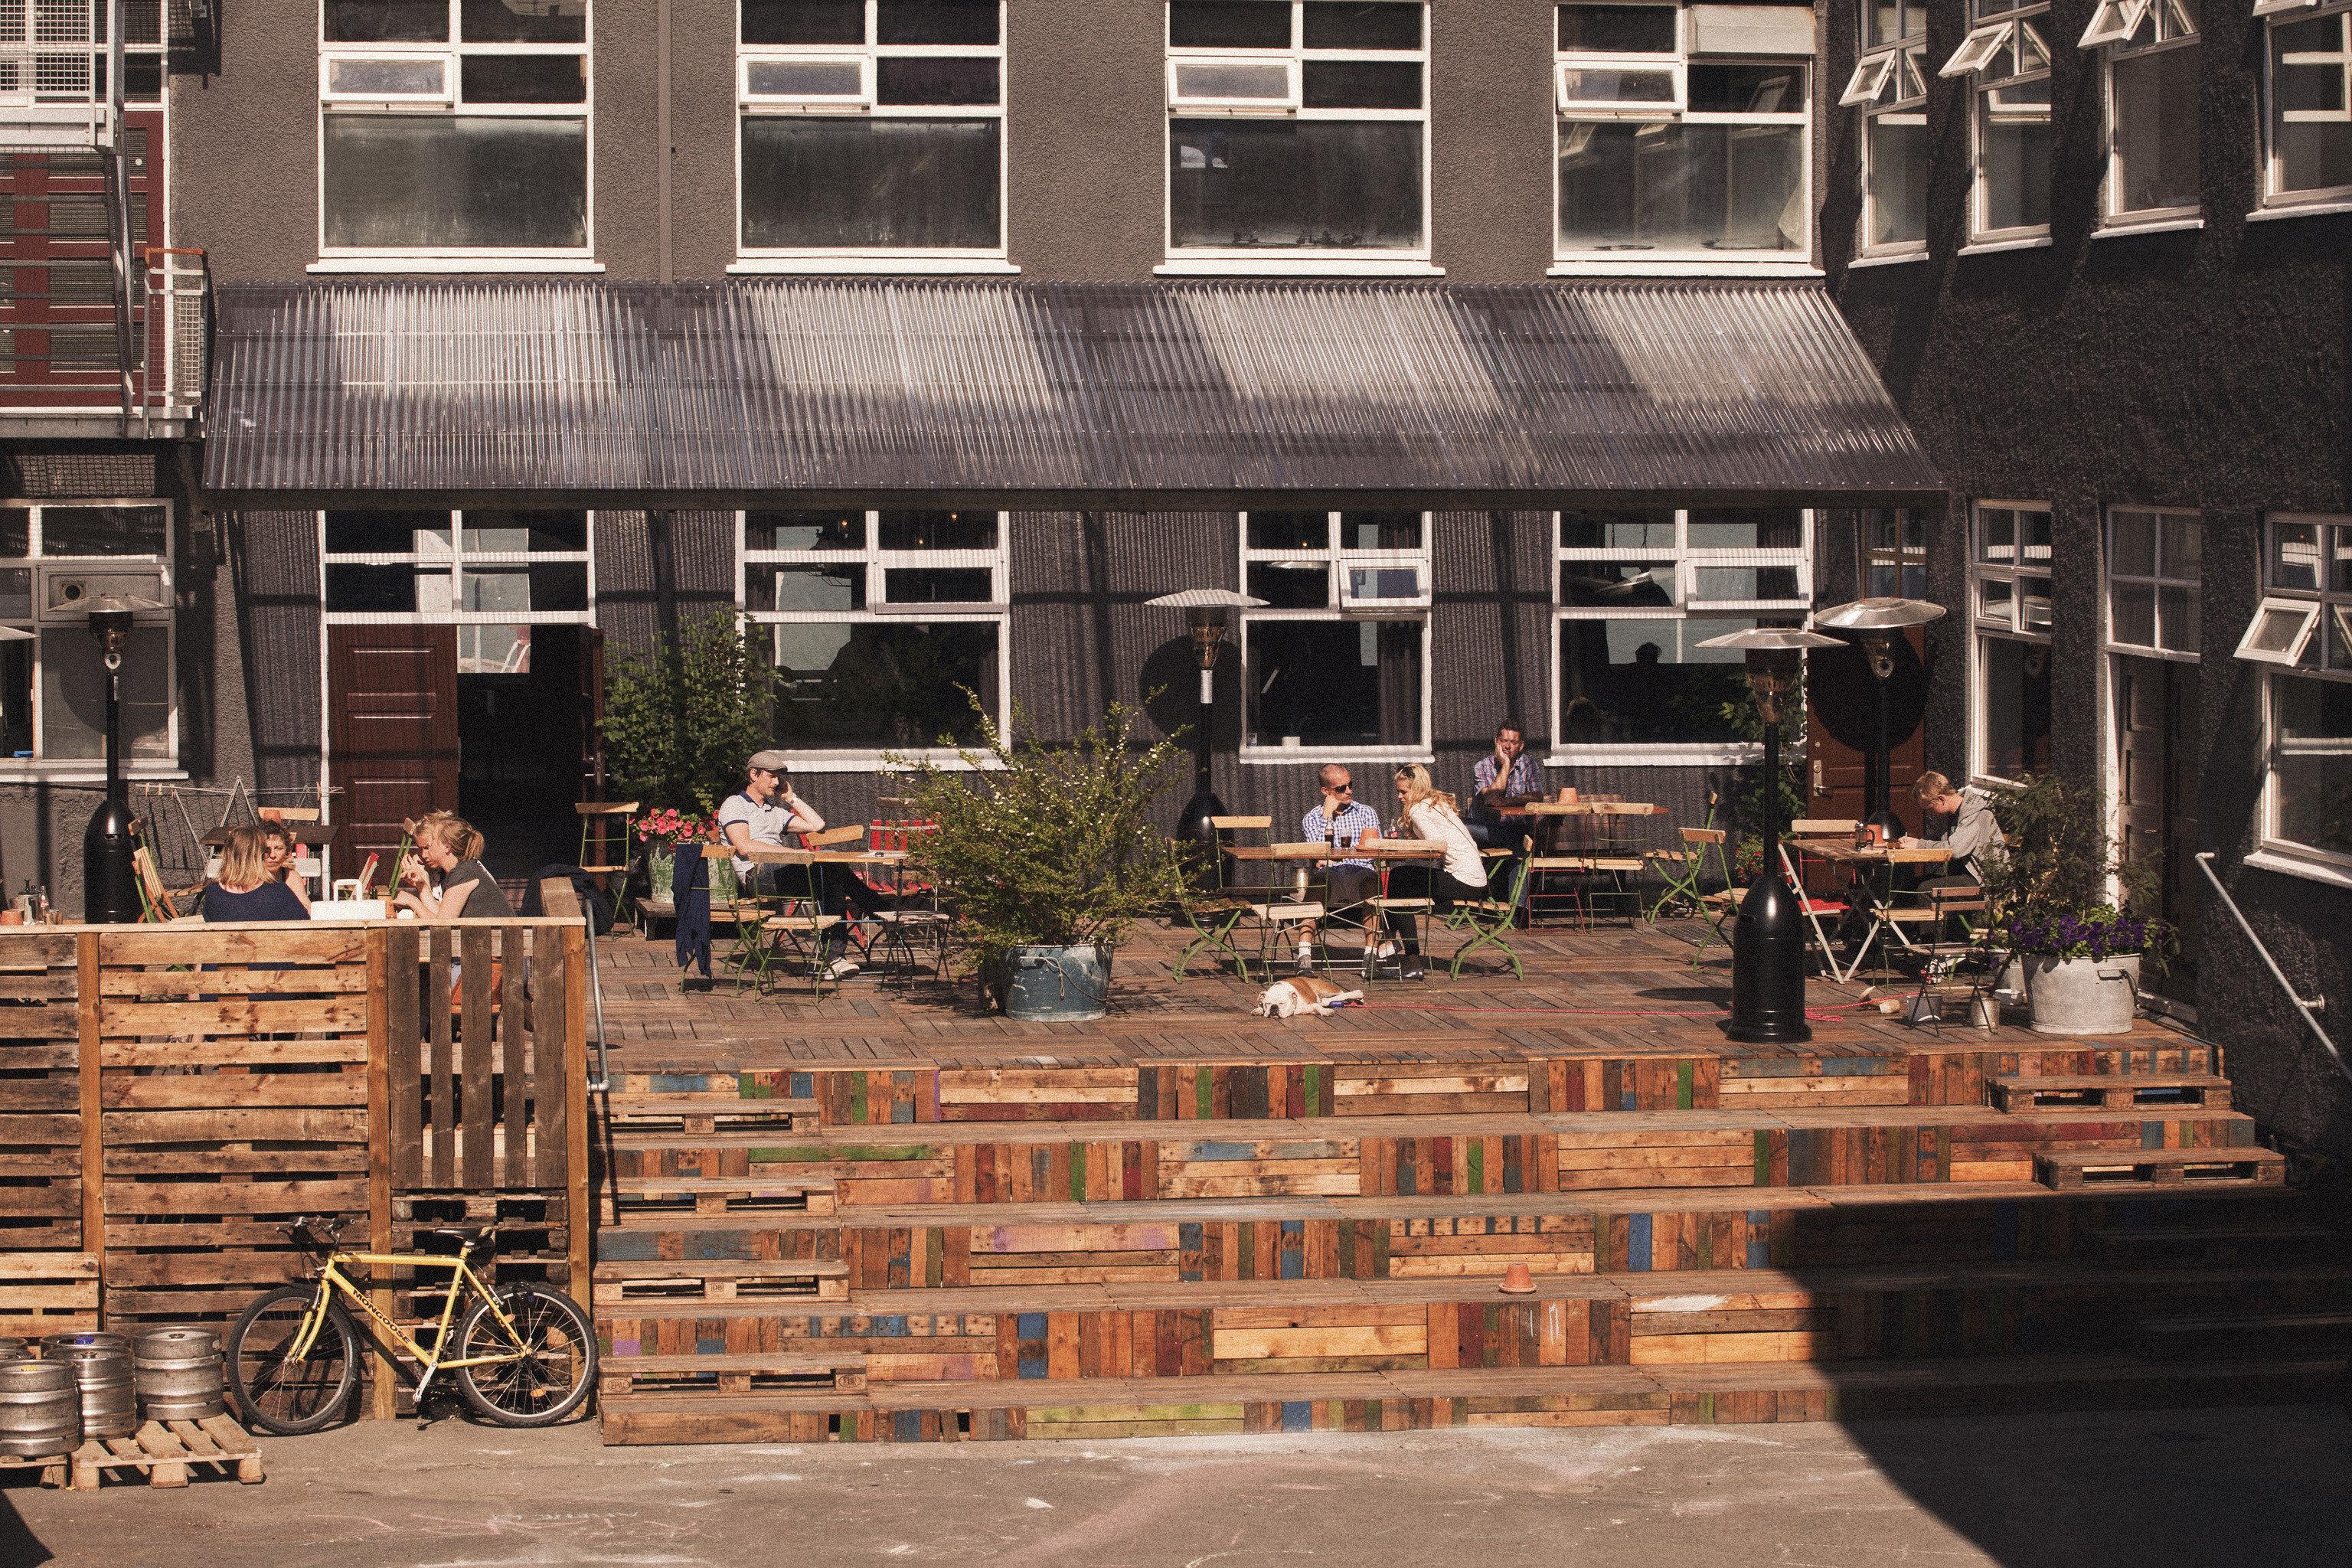 Boutique Hotels Hotels Iceland Reykjavík building outdoor urban area Architecture wood interior design